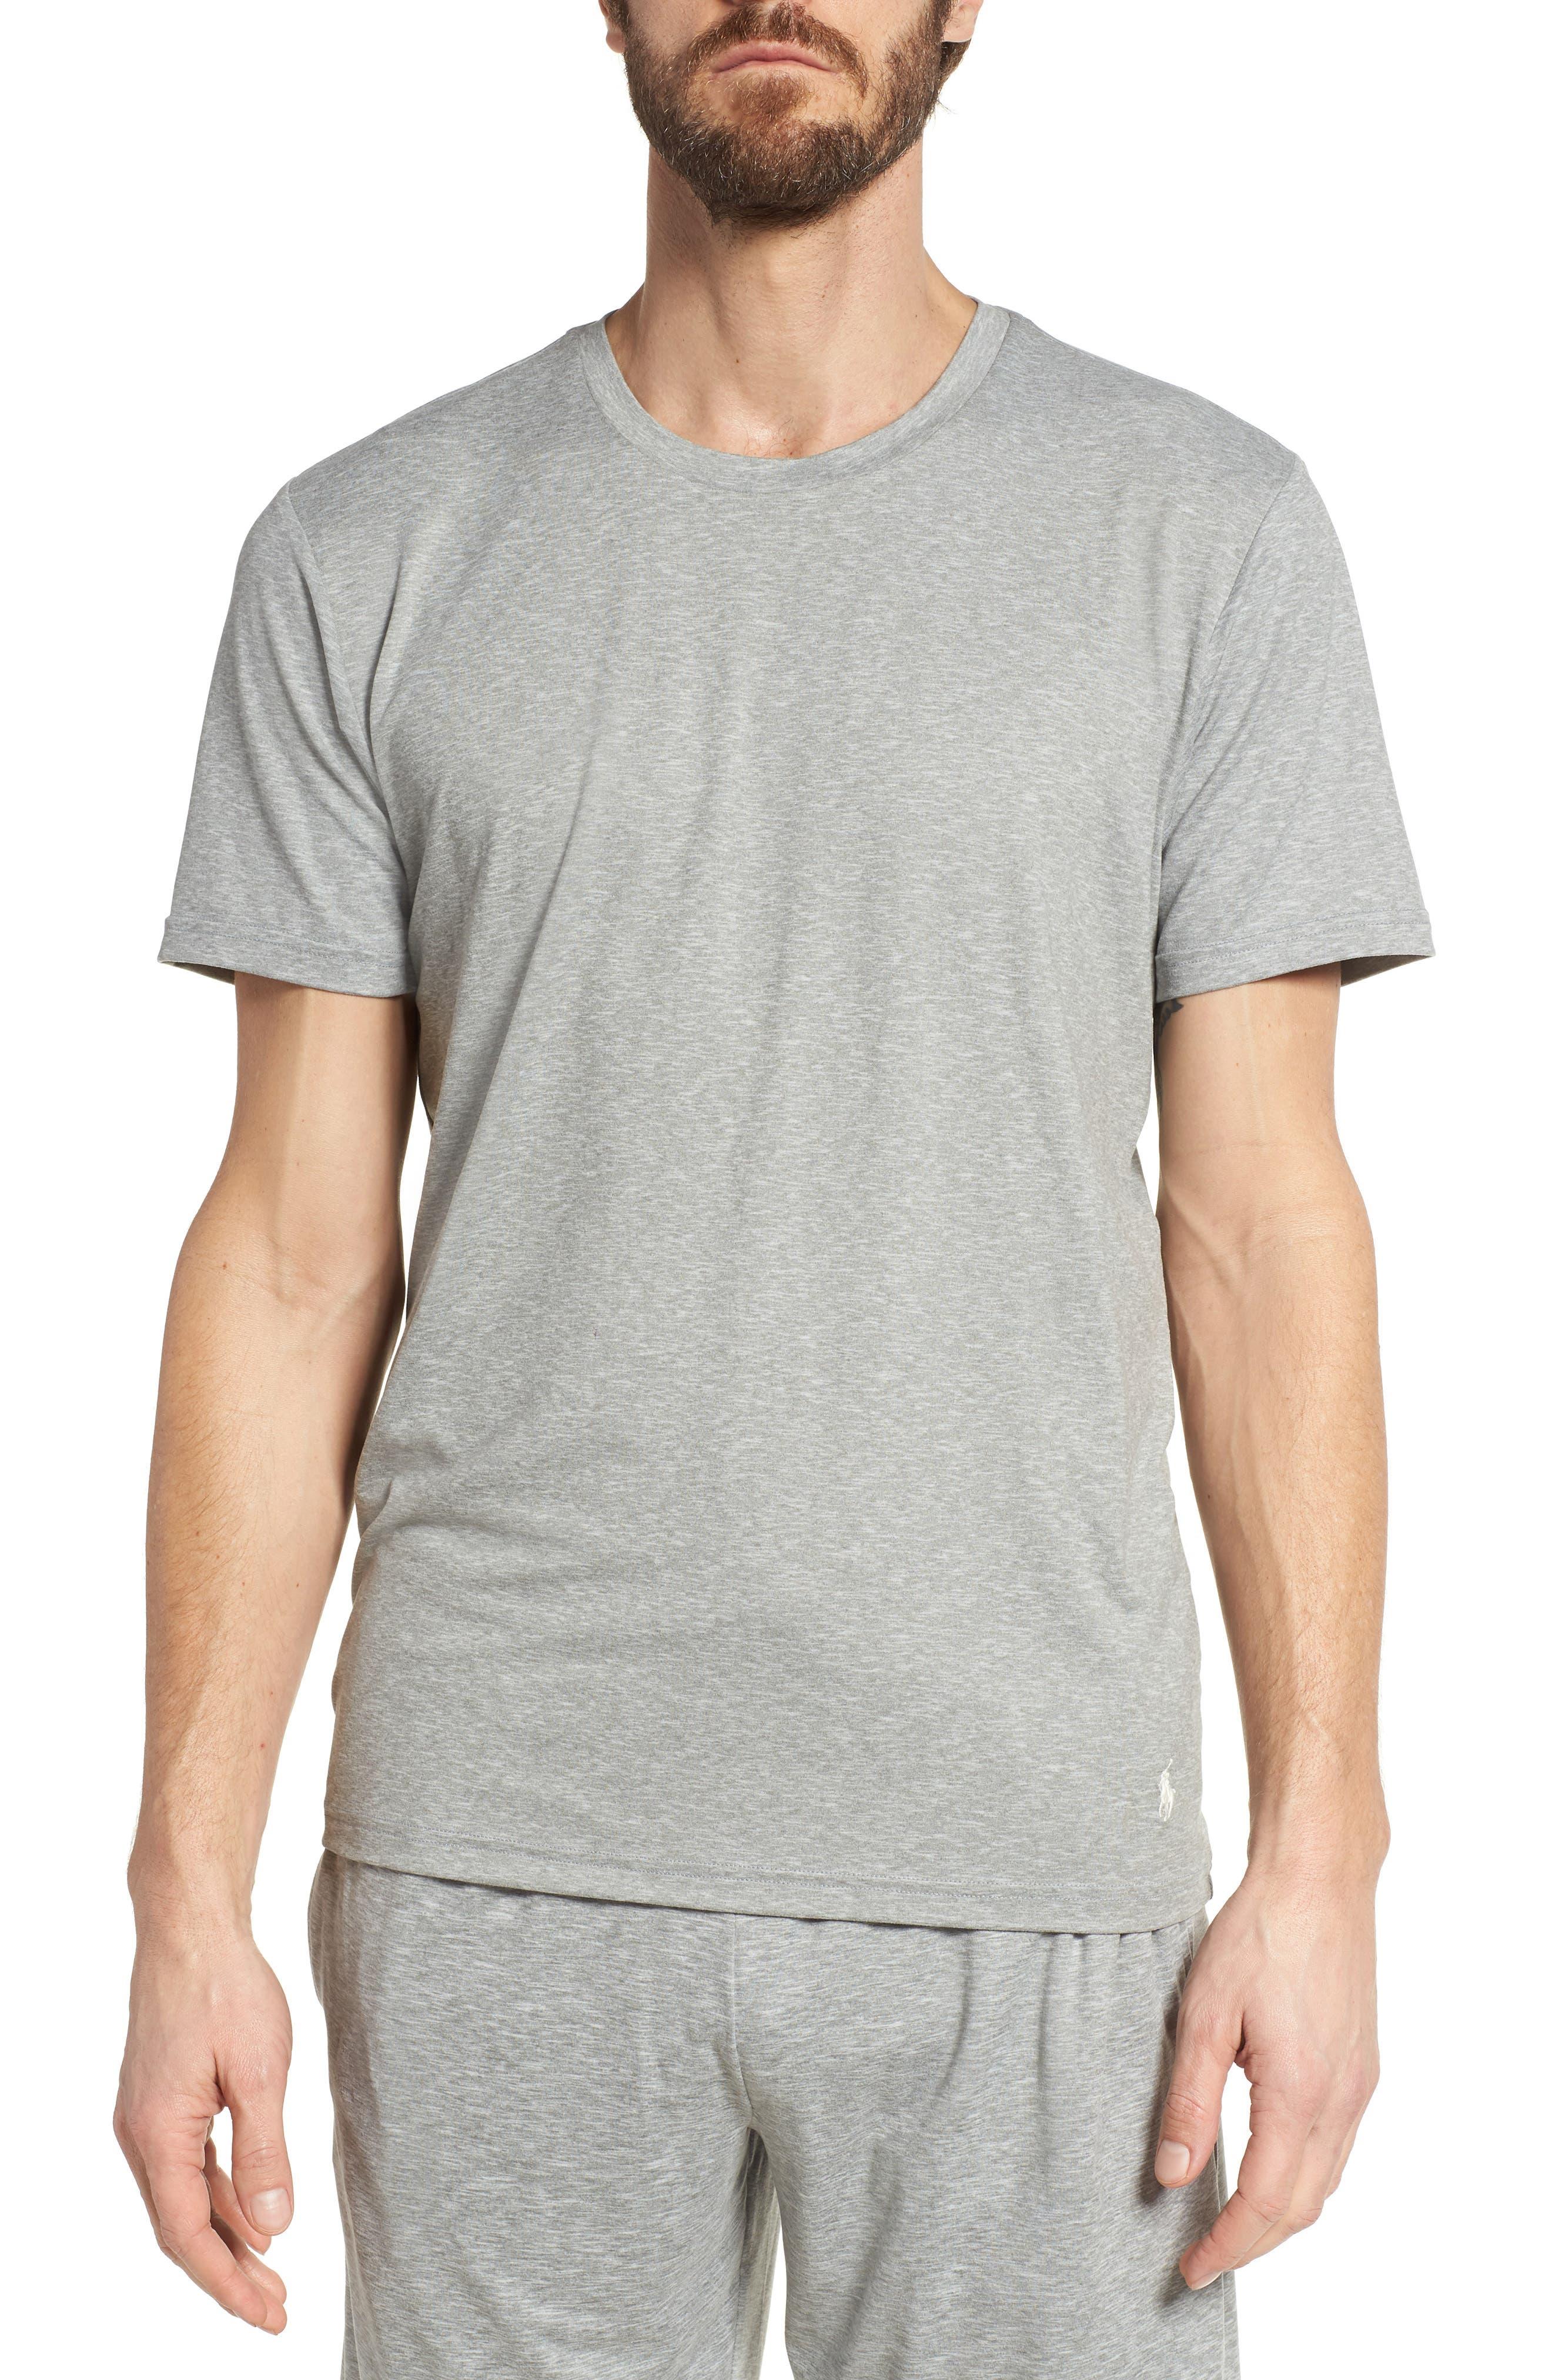 Therma Sleep Crewneck T-Shirt,                         Main,                         color, Andover Heather/ Nevis